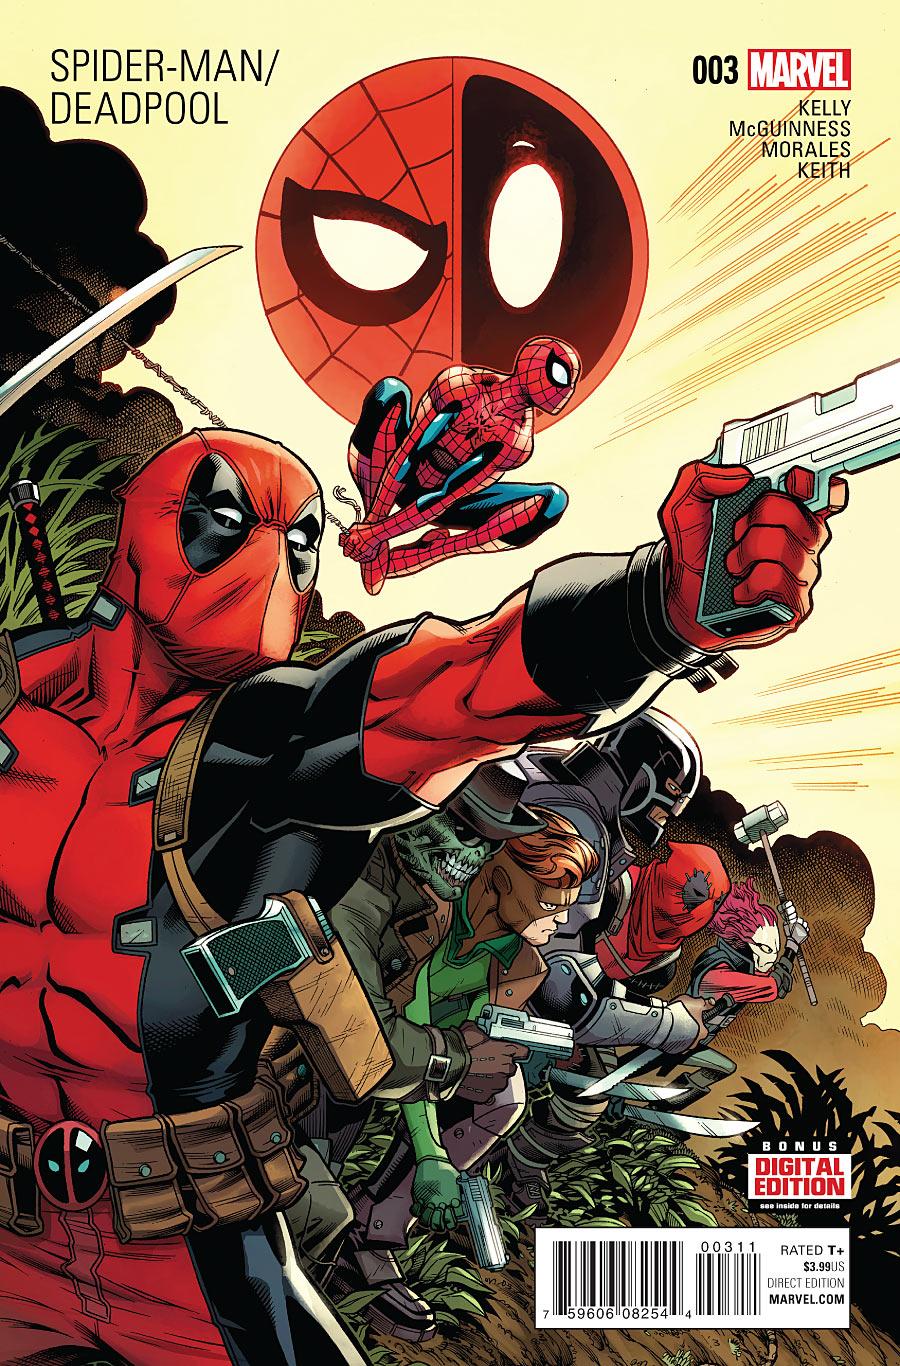 Spider-Man / Deadpool #3